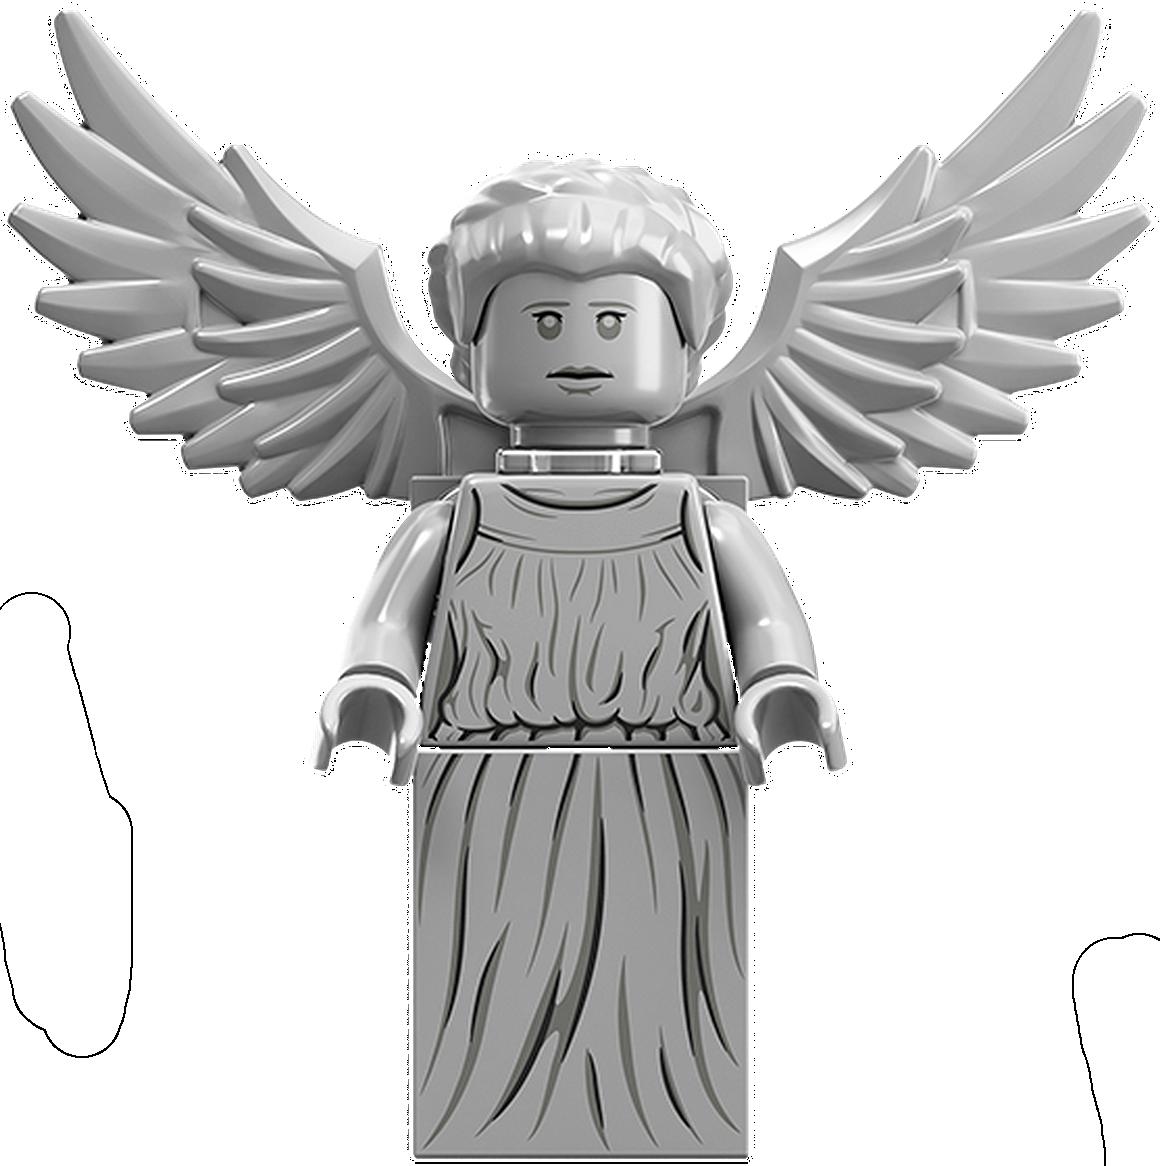 weeping angel brickipedia fandom powered by wikia